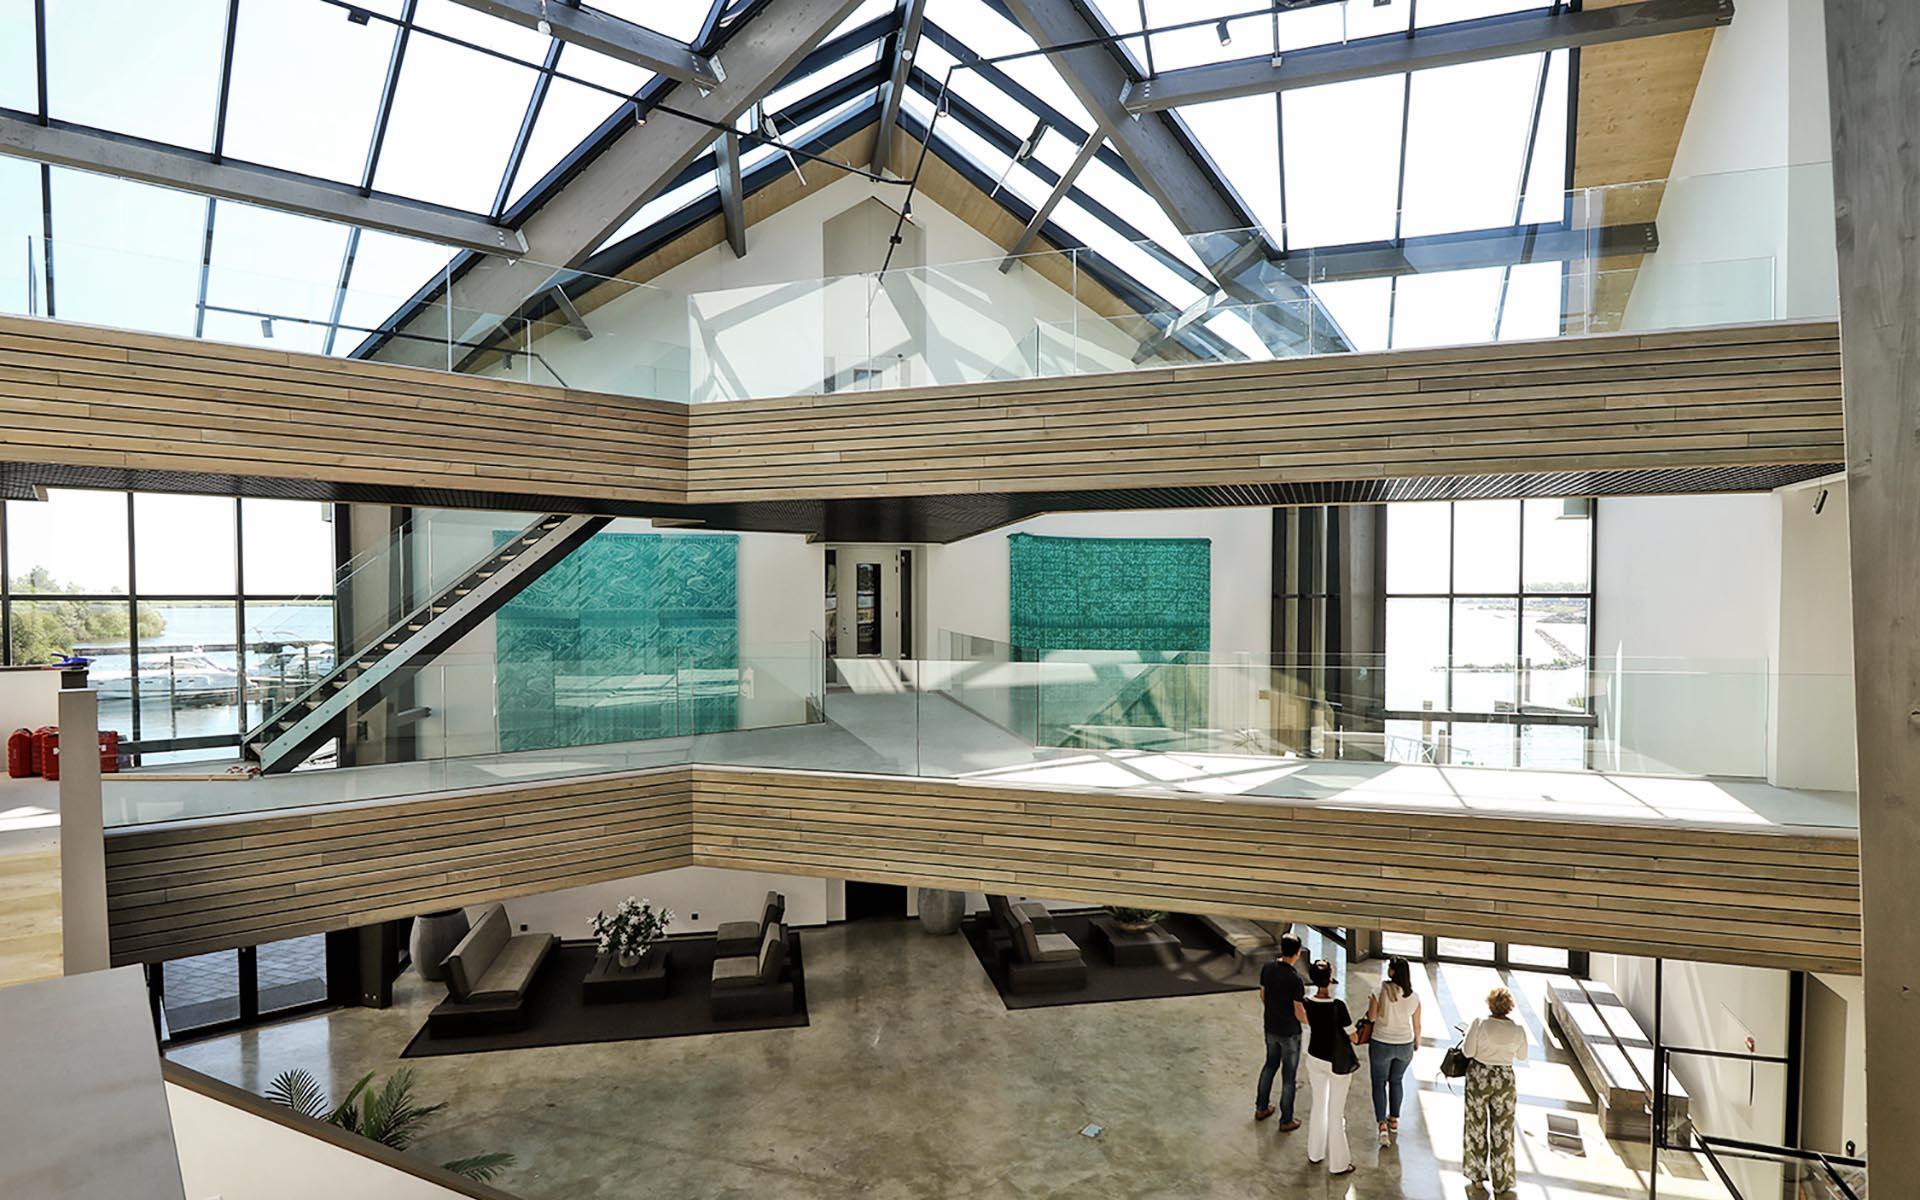 Centrumgebouw Oesterdam Resort, Tholen - BINT architecten